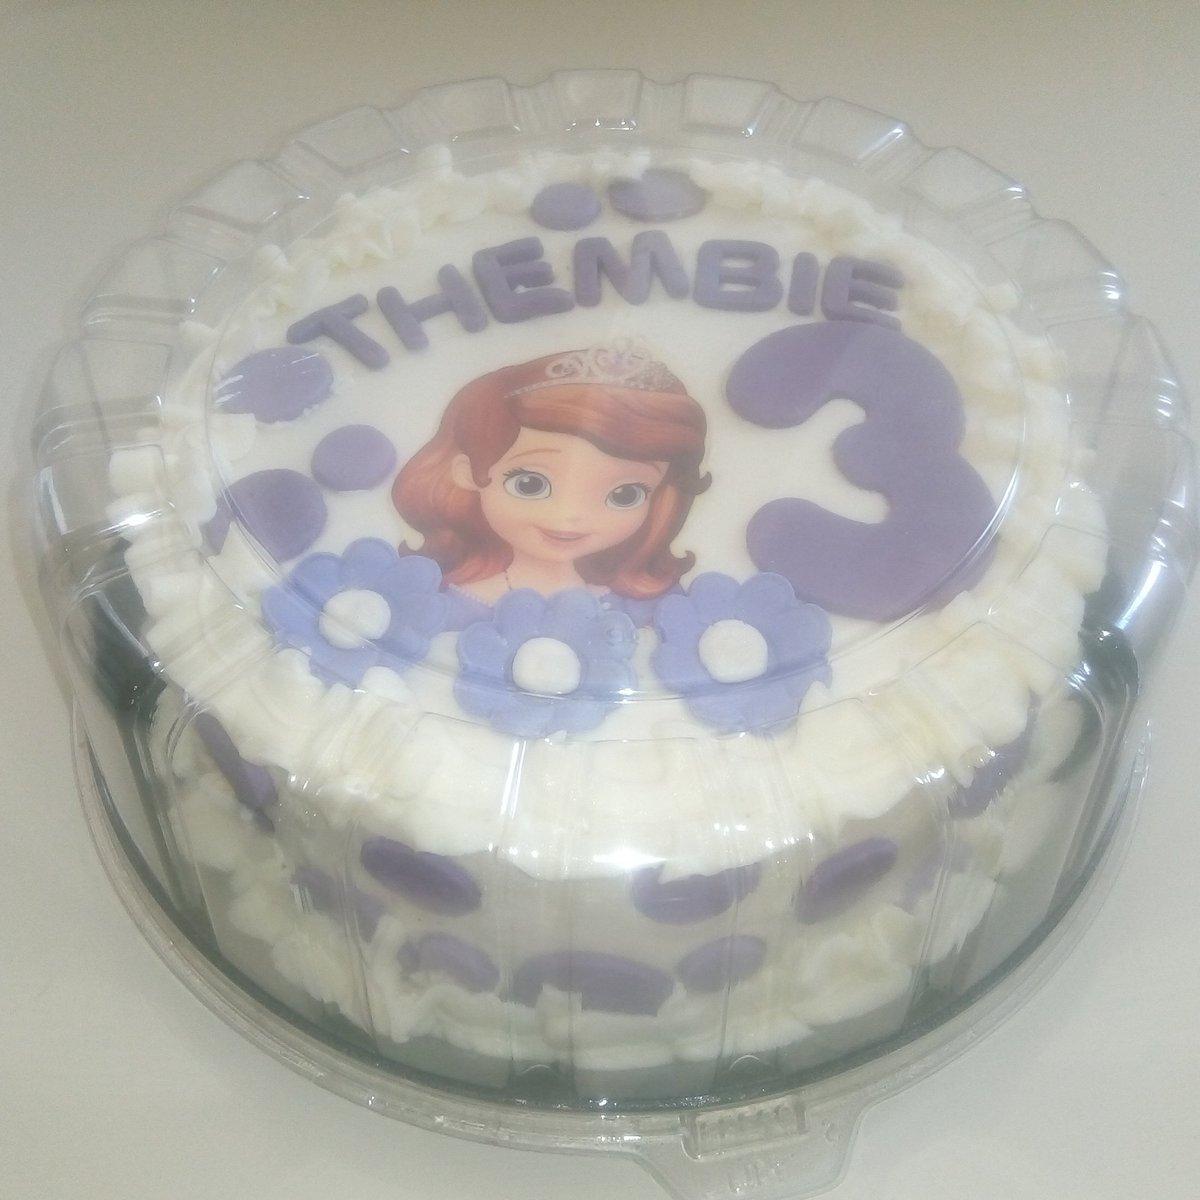 Stupendous Brilliant Cakes Auf Twitter Wedding And Birthday Cakes Carrot Funny Birthday Cards Online Elaedamsfinfo